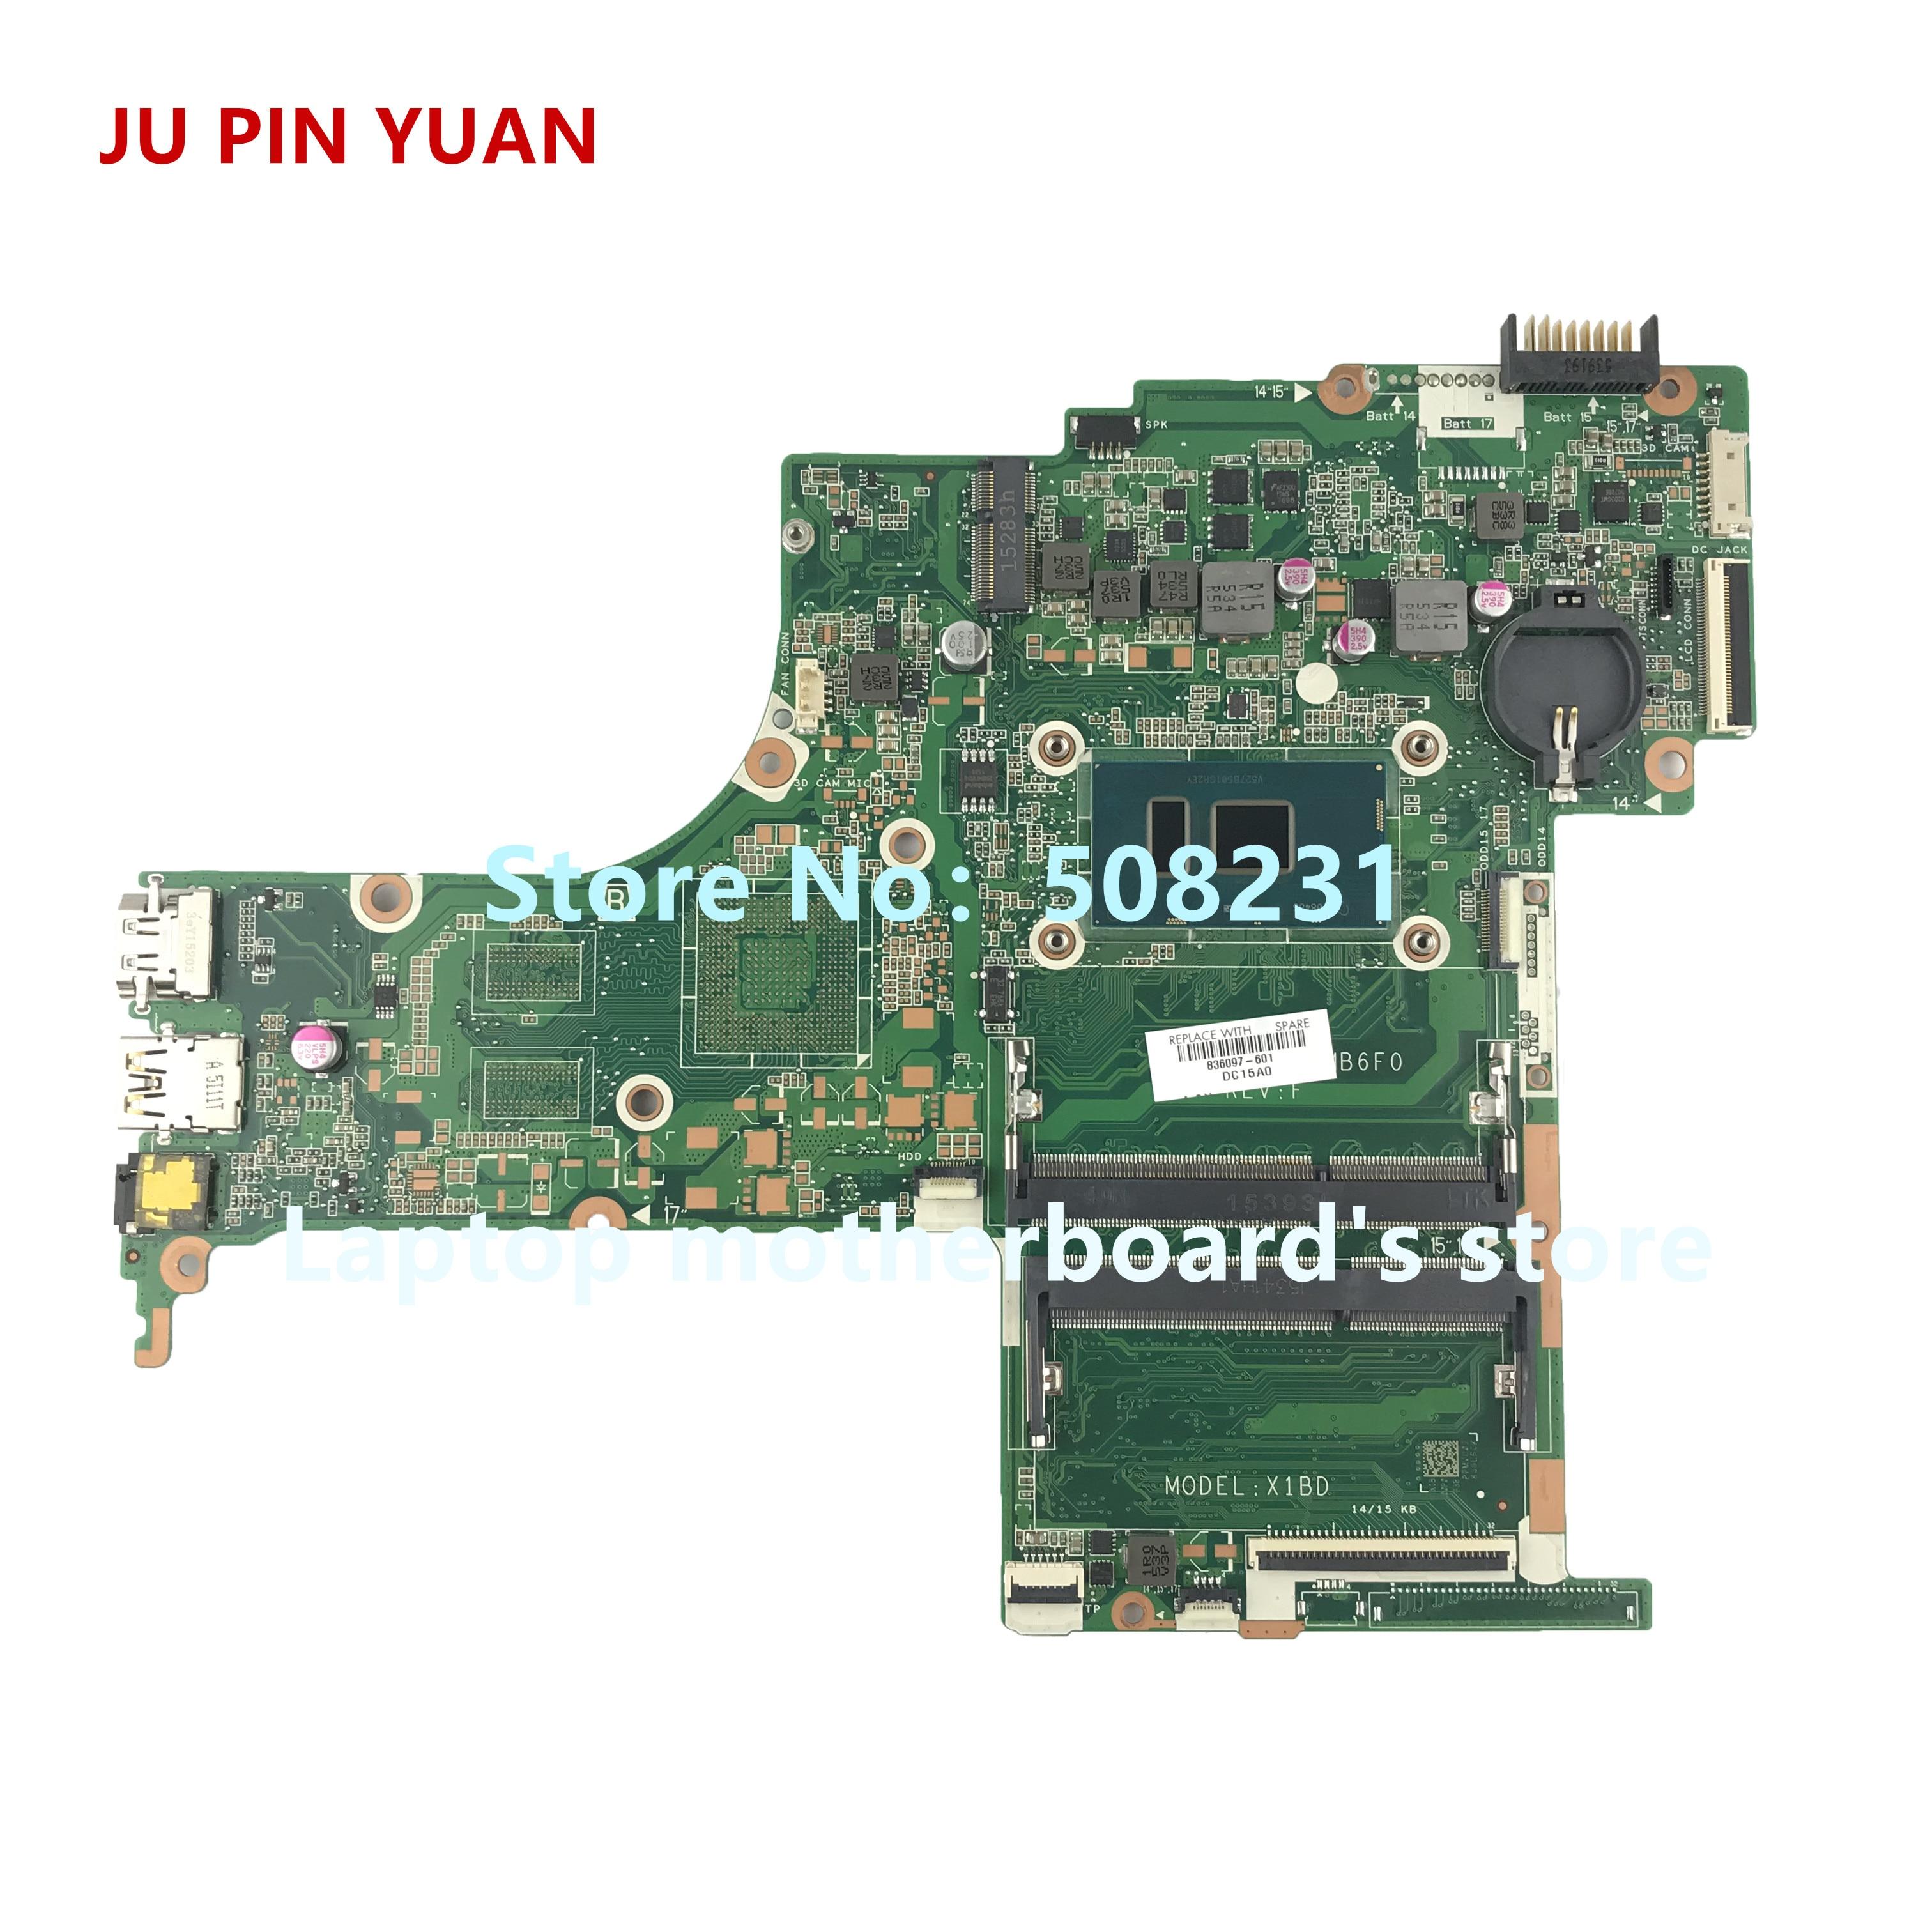 Ju pin Yuan 836097-601 836097-001 X1BD DAX1BDMB6F0 para HP Pavilion Notebook 15-AB 15T-AB 15-una placa base para ordenador portátil i5-6200U